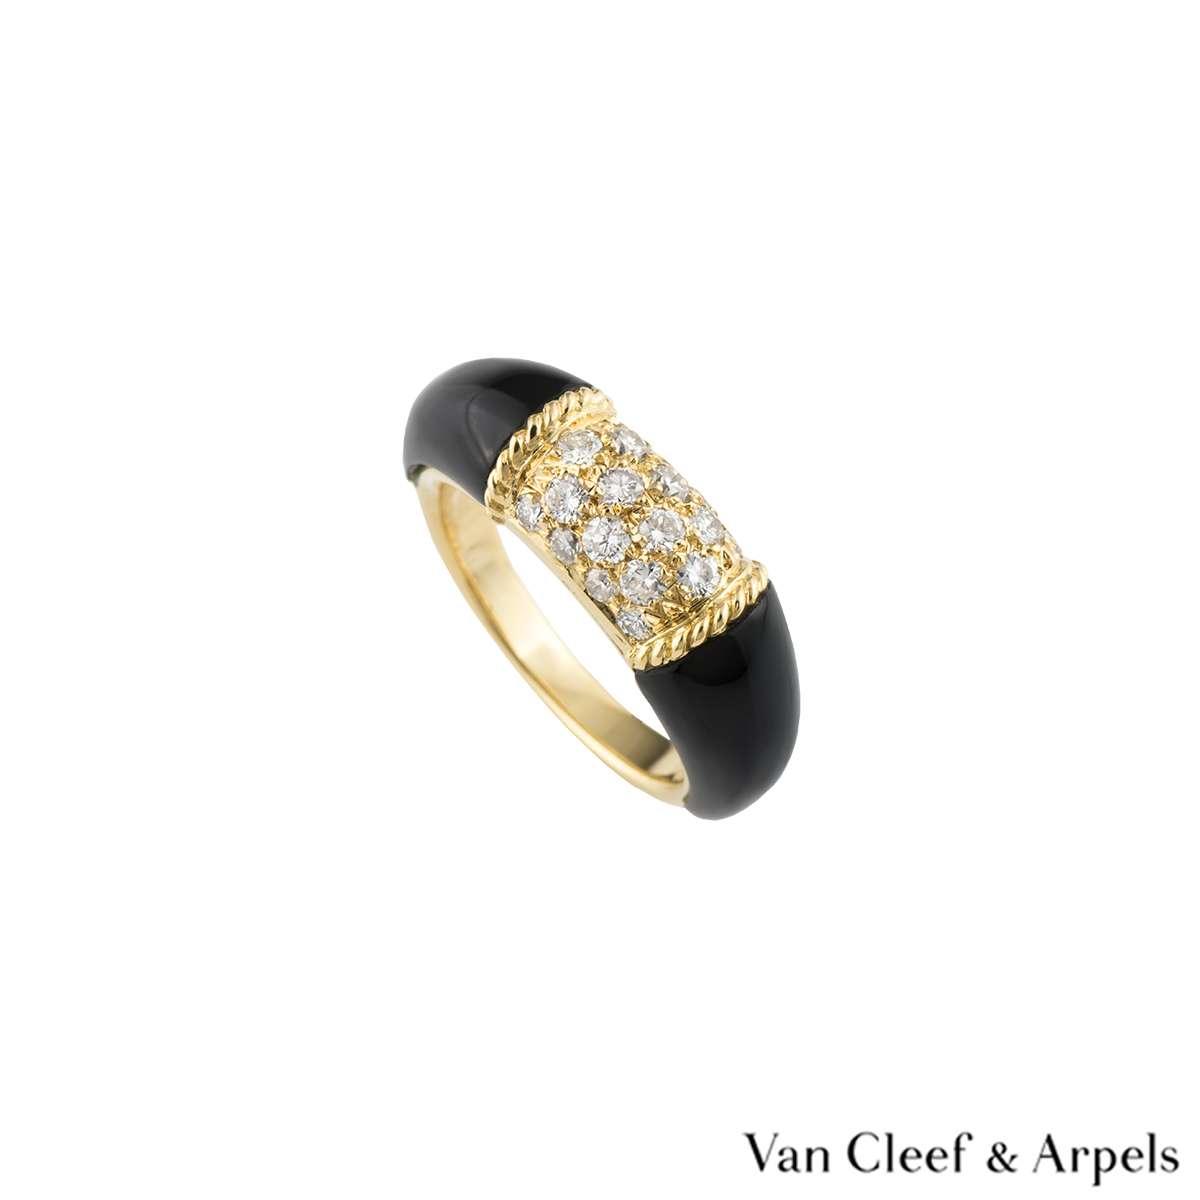 Van Cleef & Arpels Philippine Ring